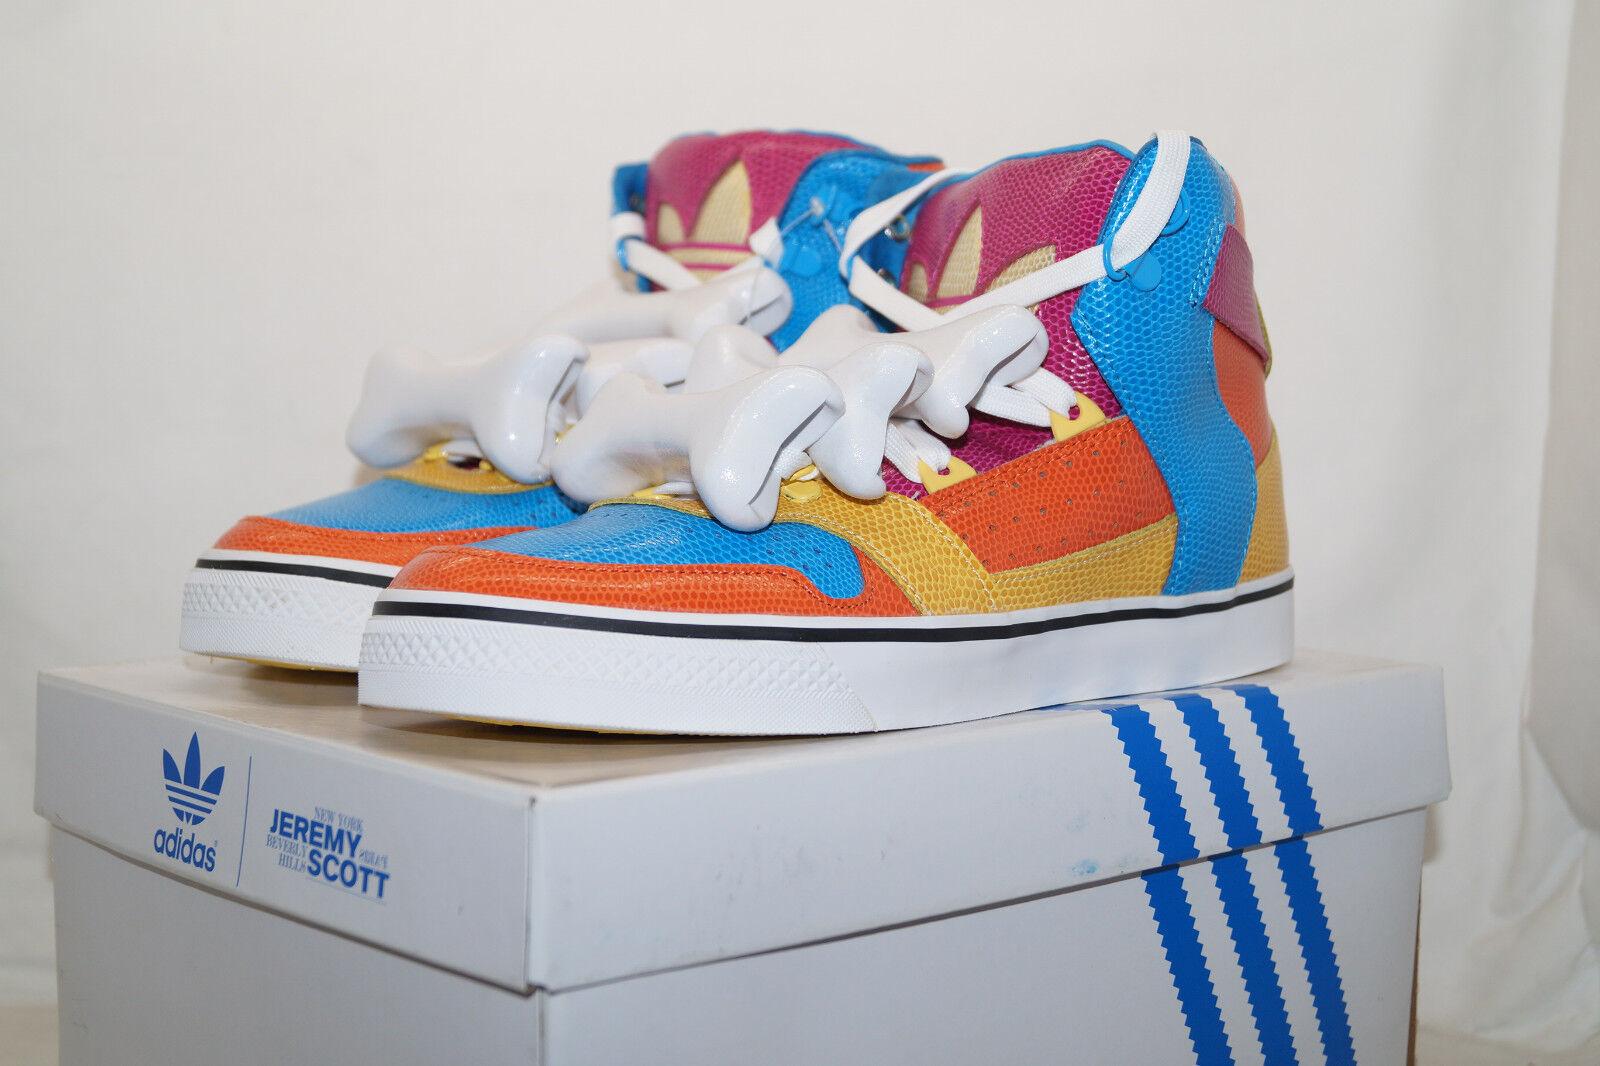 Adidas Originals Jeremy Scott JS Bones Multicolore d65207 UE 40.6 UK 7 d65207 Multicolore 9c77a6